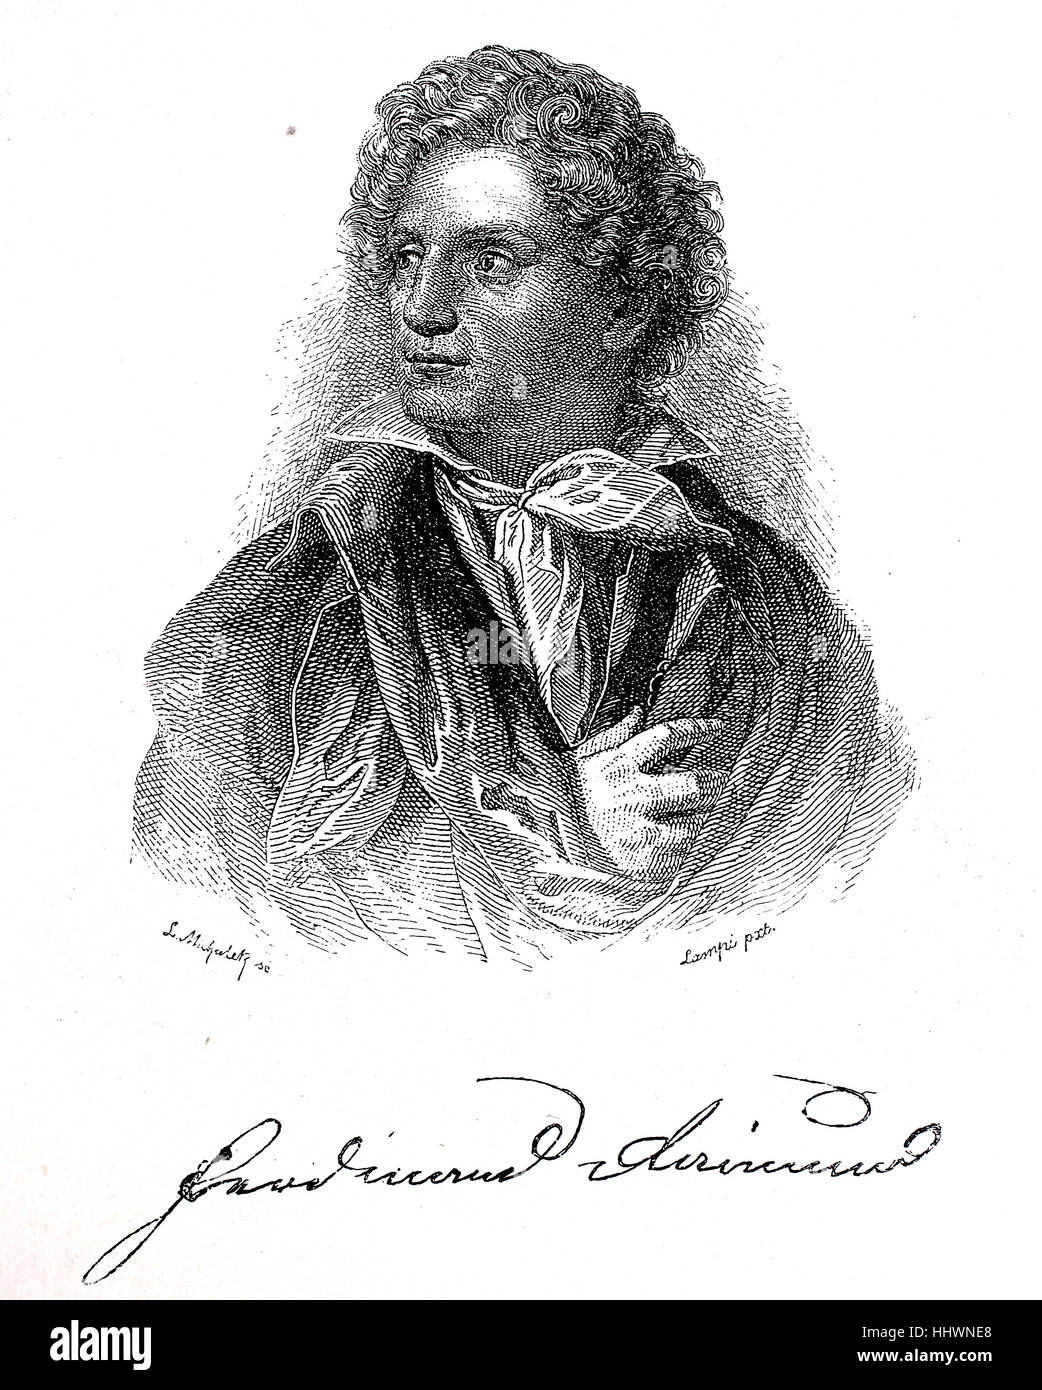 Ferdinand Raimund, born Ferdinand Jakob Raimann; 1 June 1790 - 5 September 1836, was an Austrian actor and dramatist', - Stock Image